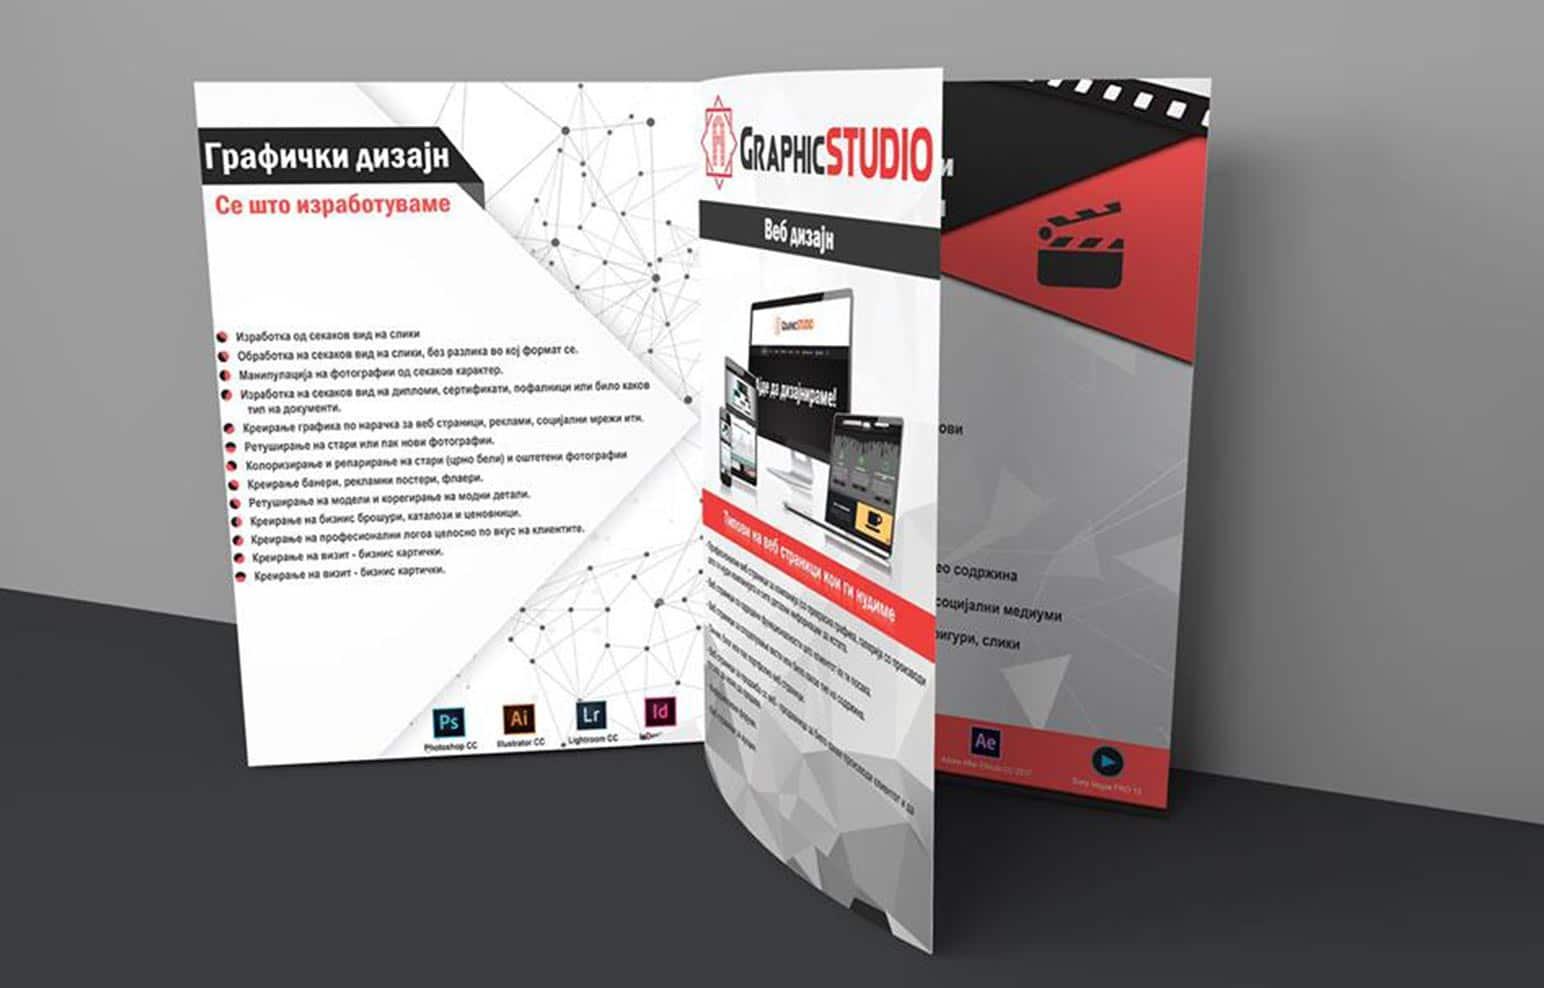 Katalog so uslugi - Graficki dizajn mokap, Каталог со услуги - Графички дизајн мокап